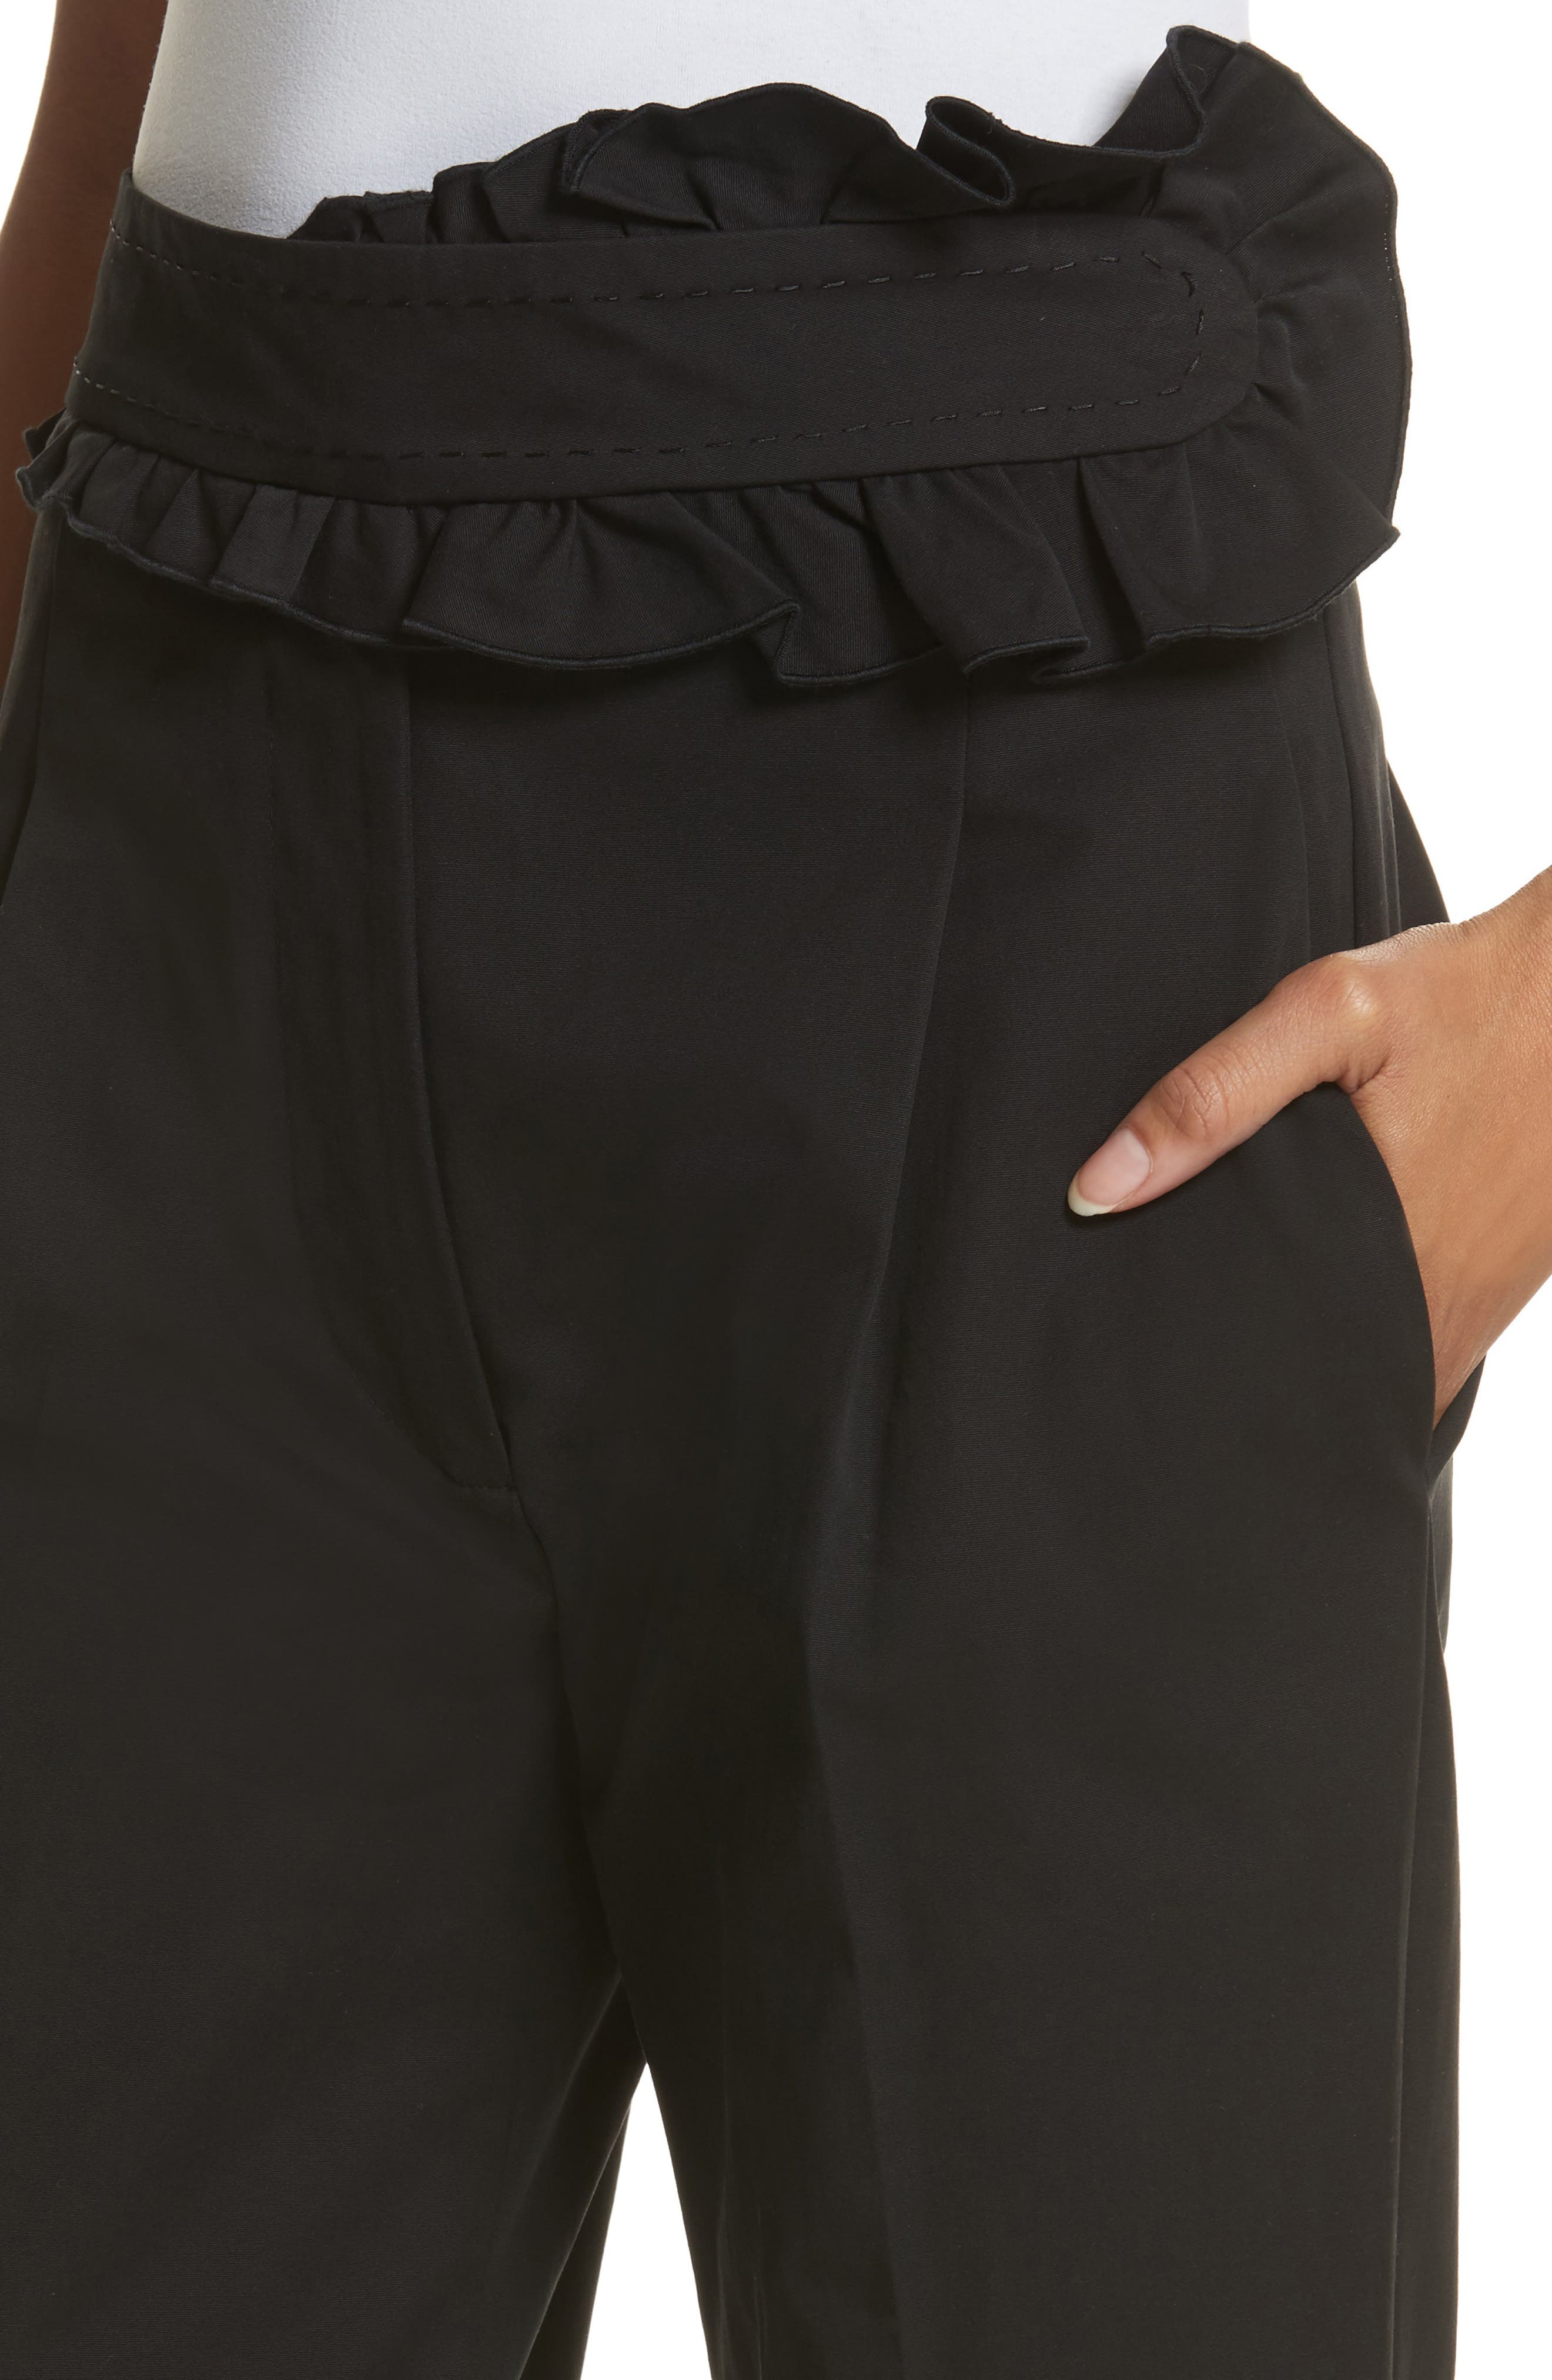 Ruffle Waist Crop Pants,                             Alternate thumbnail 4, color,                             001